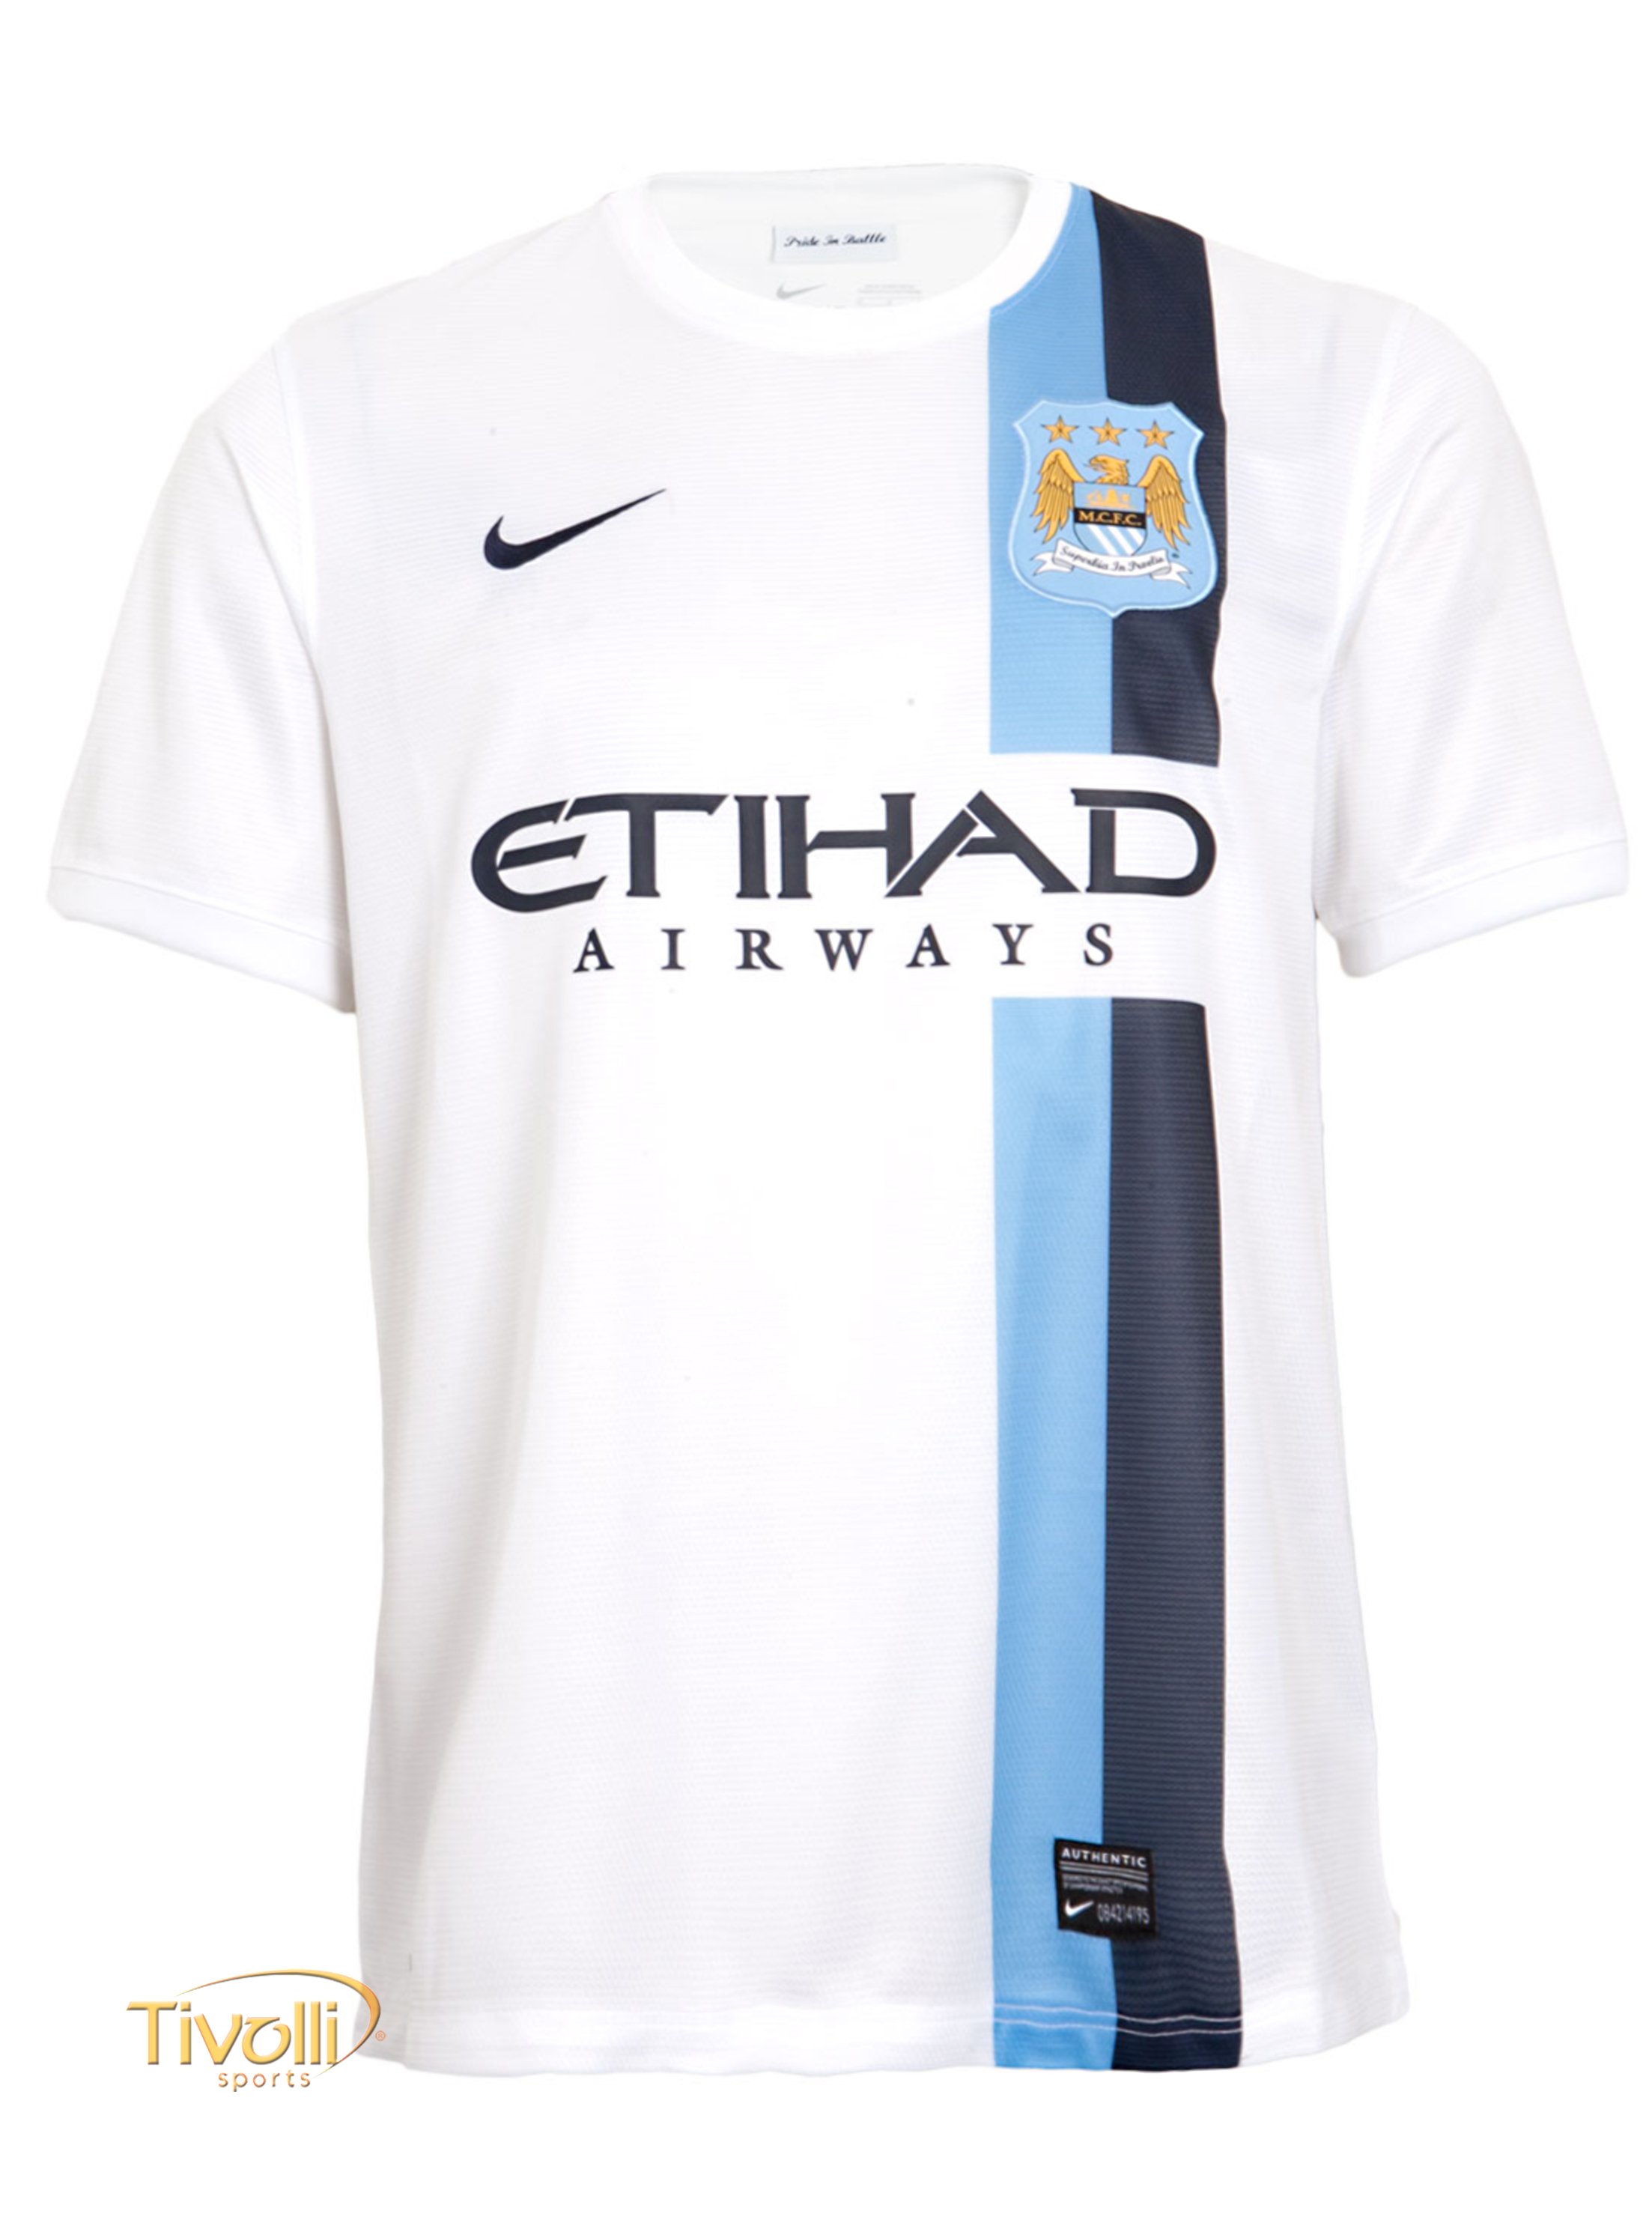 d50b82302f9bd Black Friday - Camisa Manchester City III 2013 14 Nike Masculina Branca e  Azul